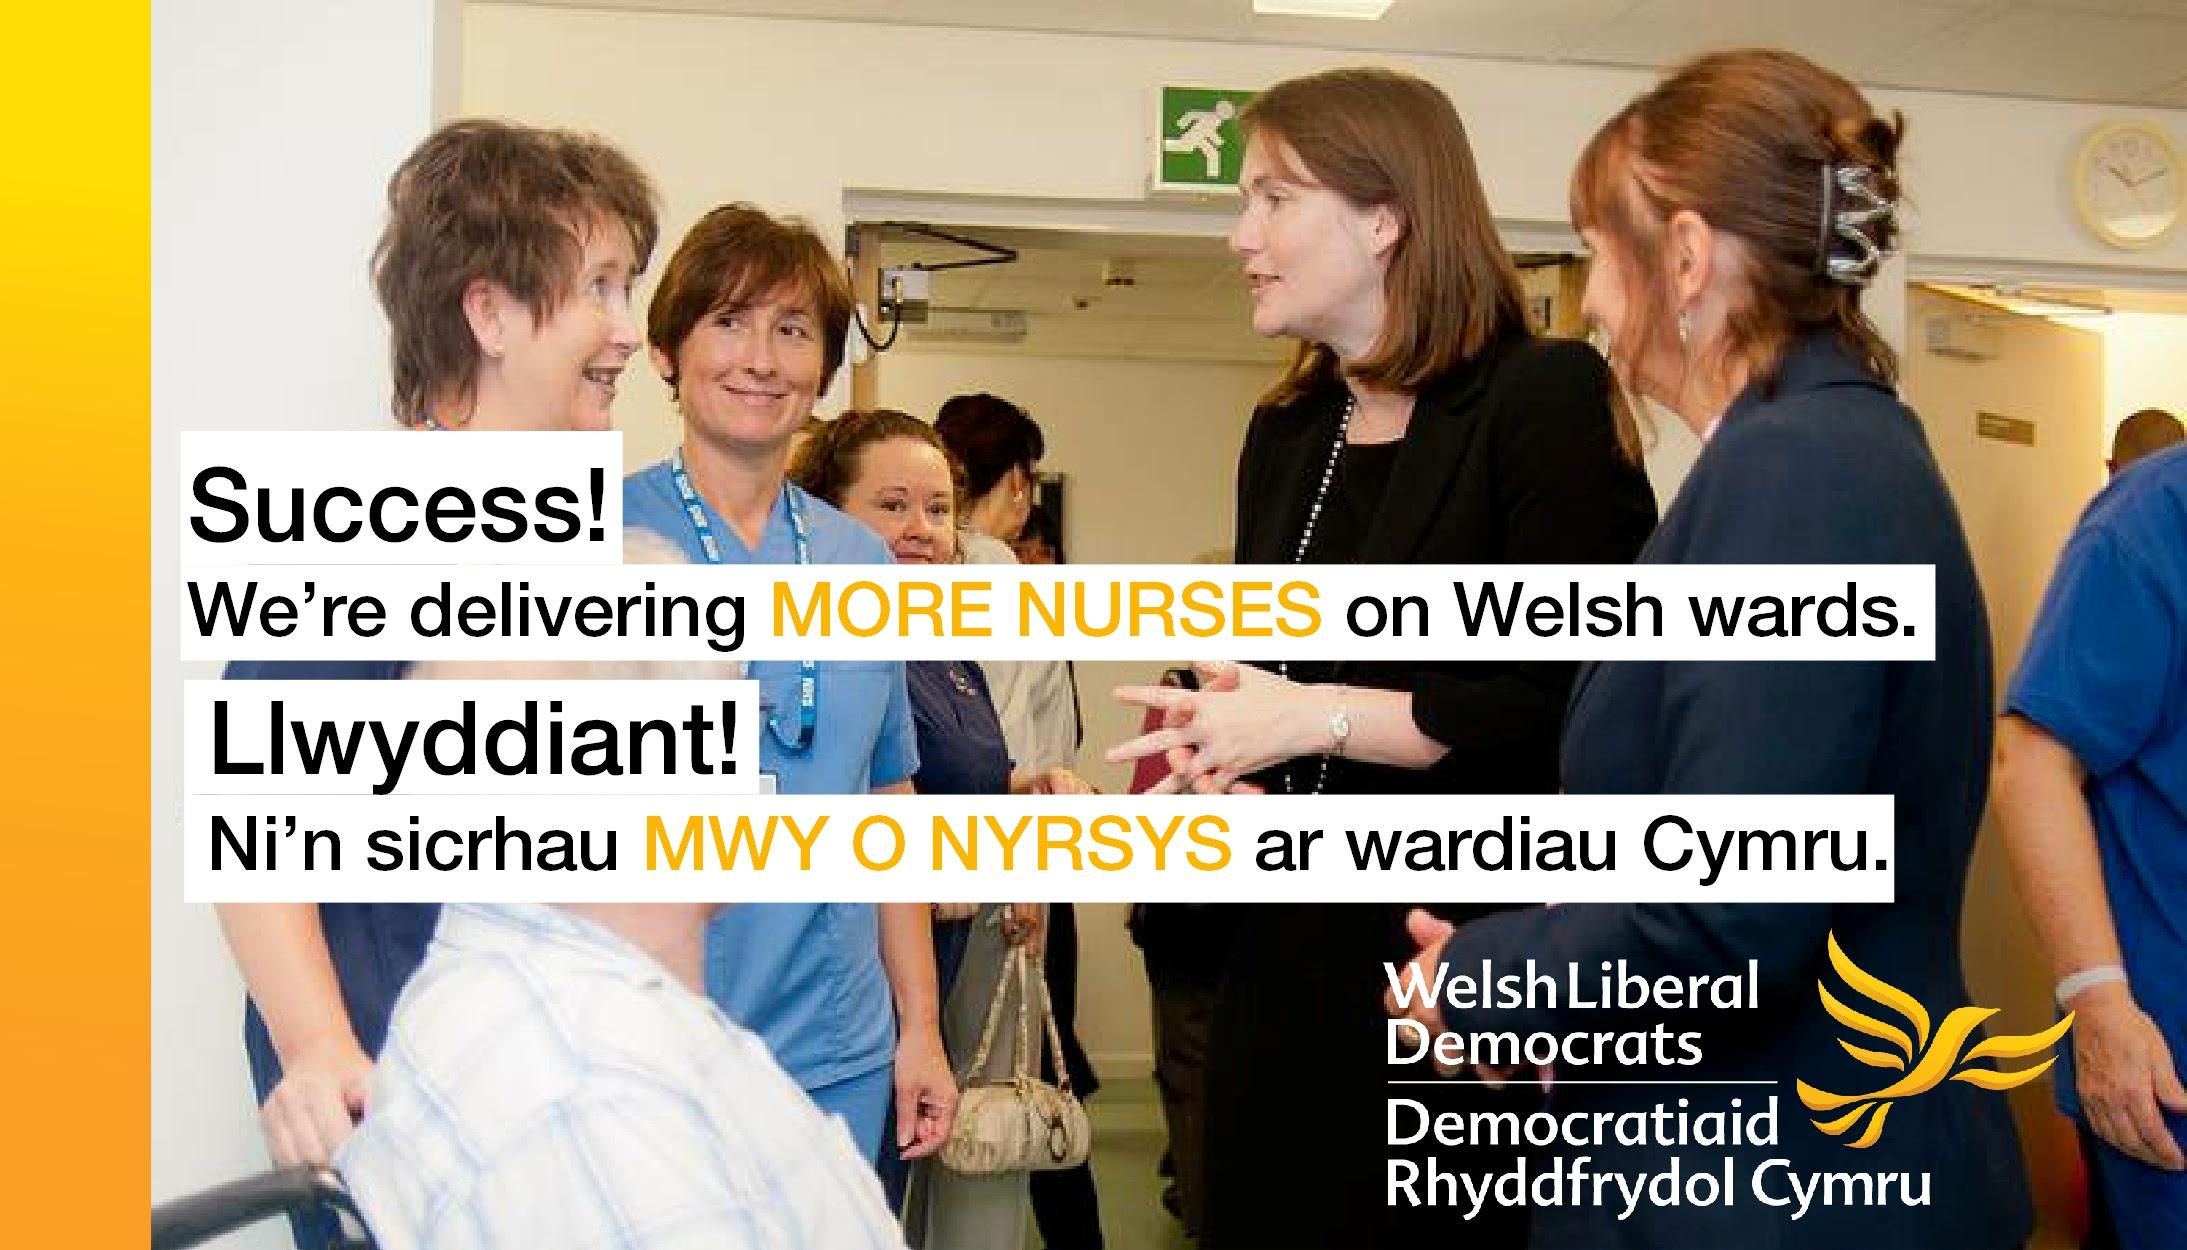 More_Nurses_success.jpg